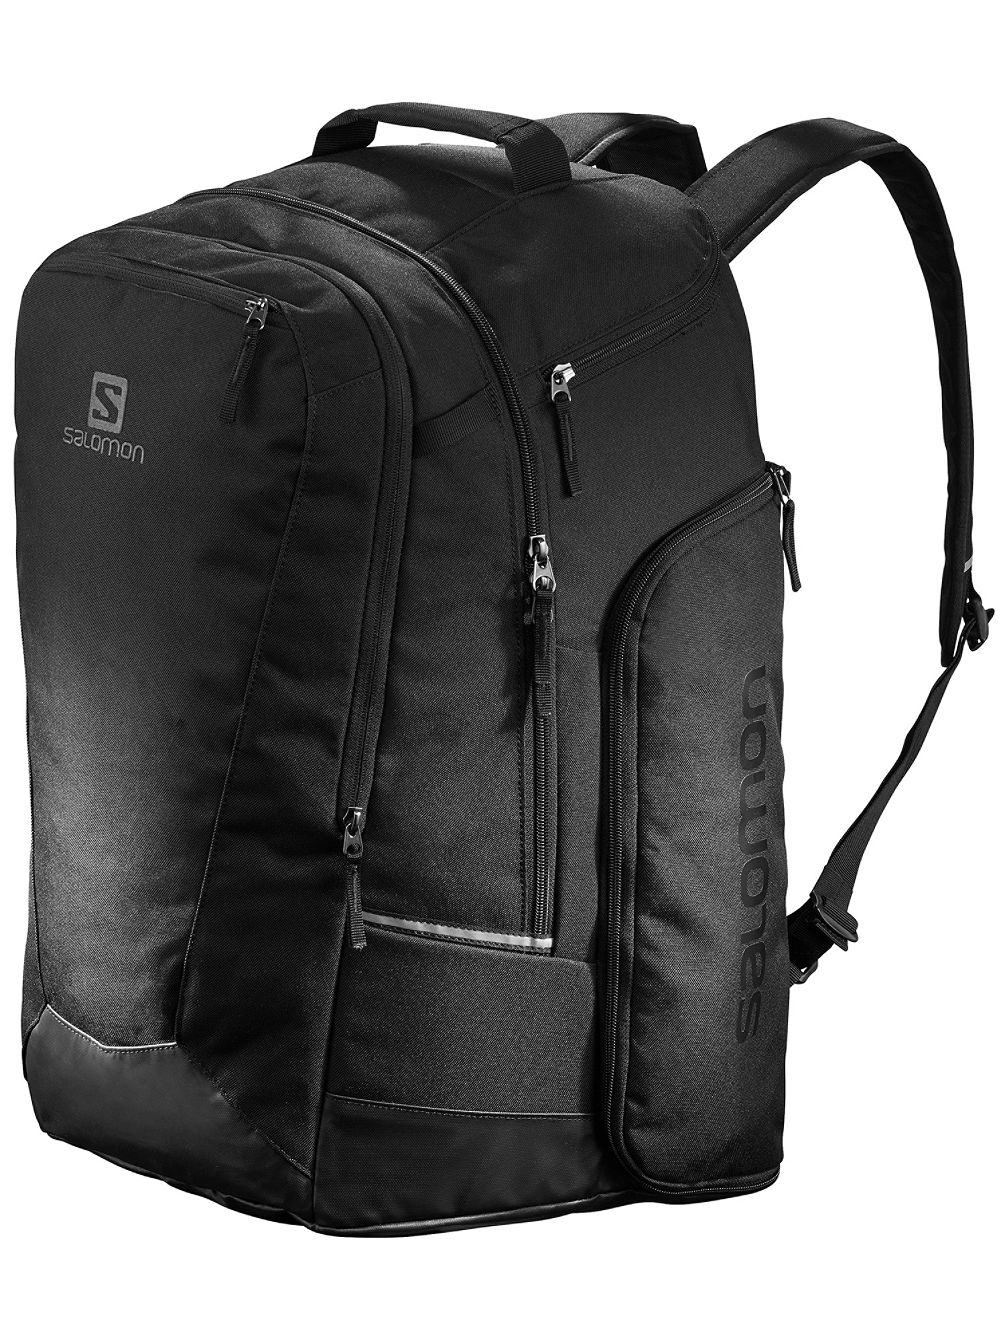 vente chaude en ligne 92879 dba65 Extend Go-To-Snow Boot Bag